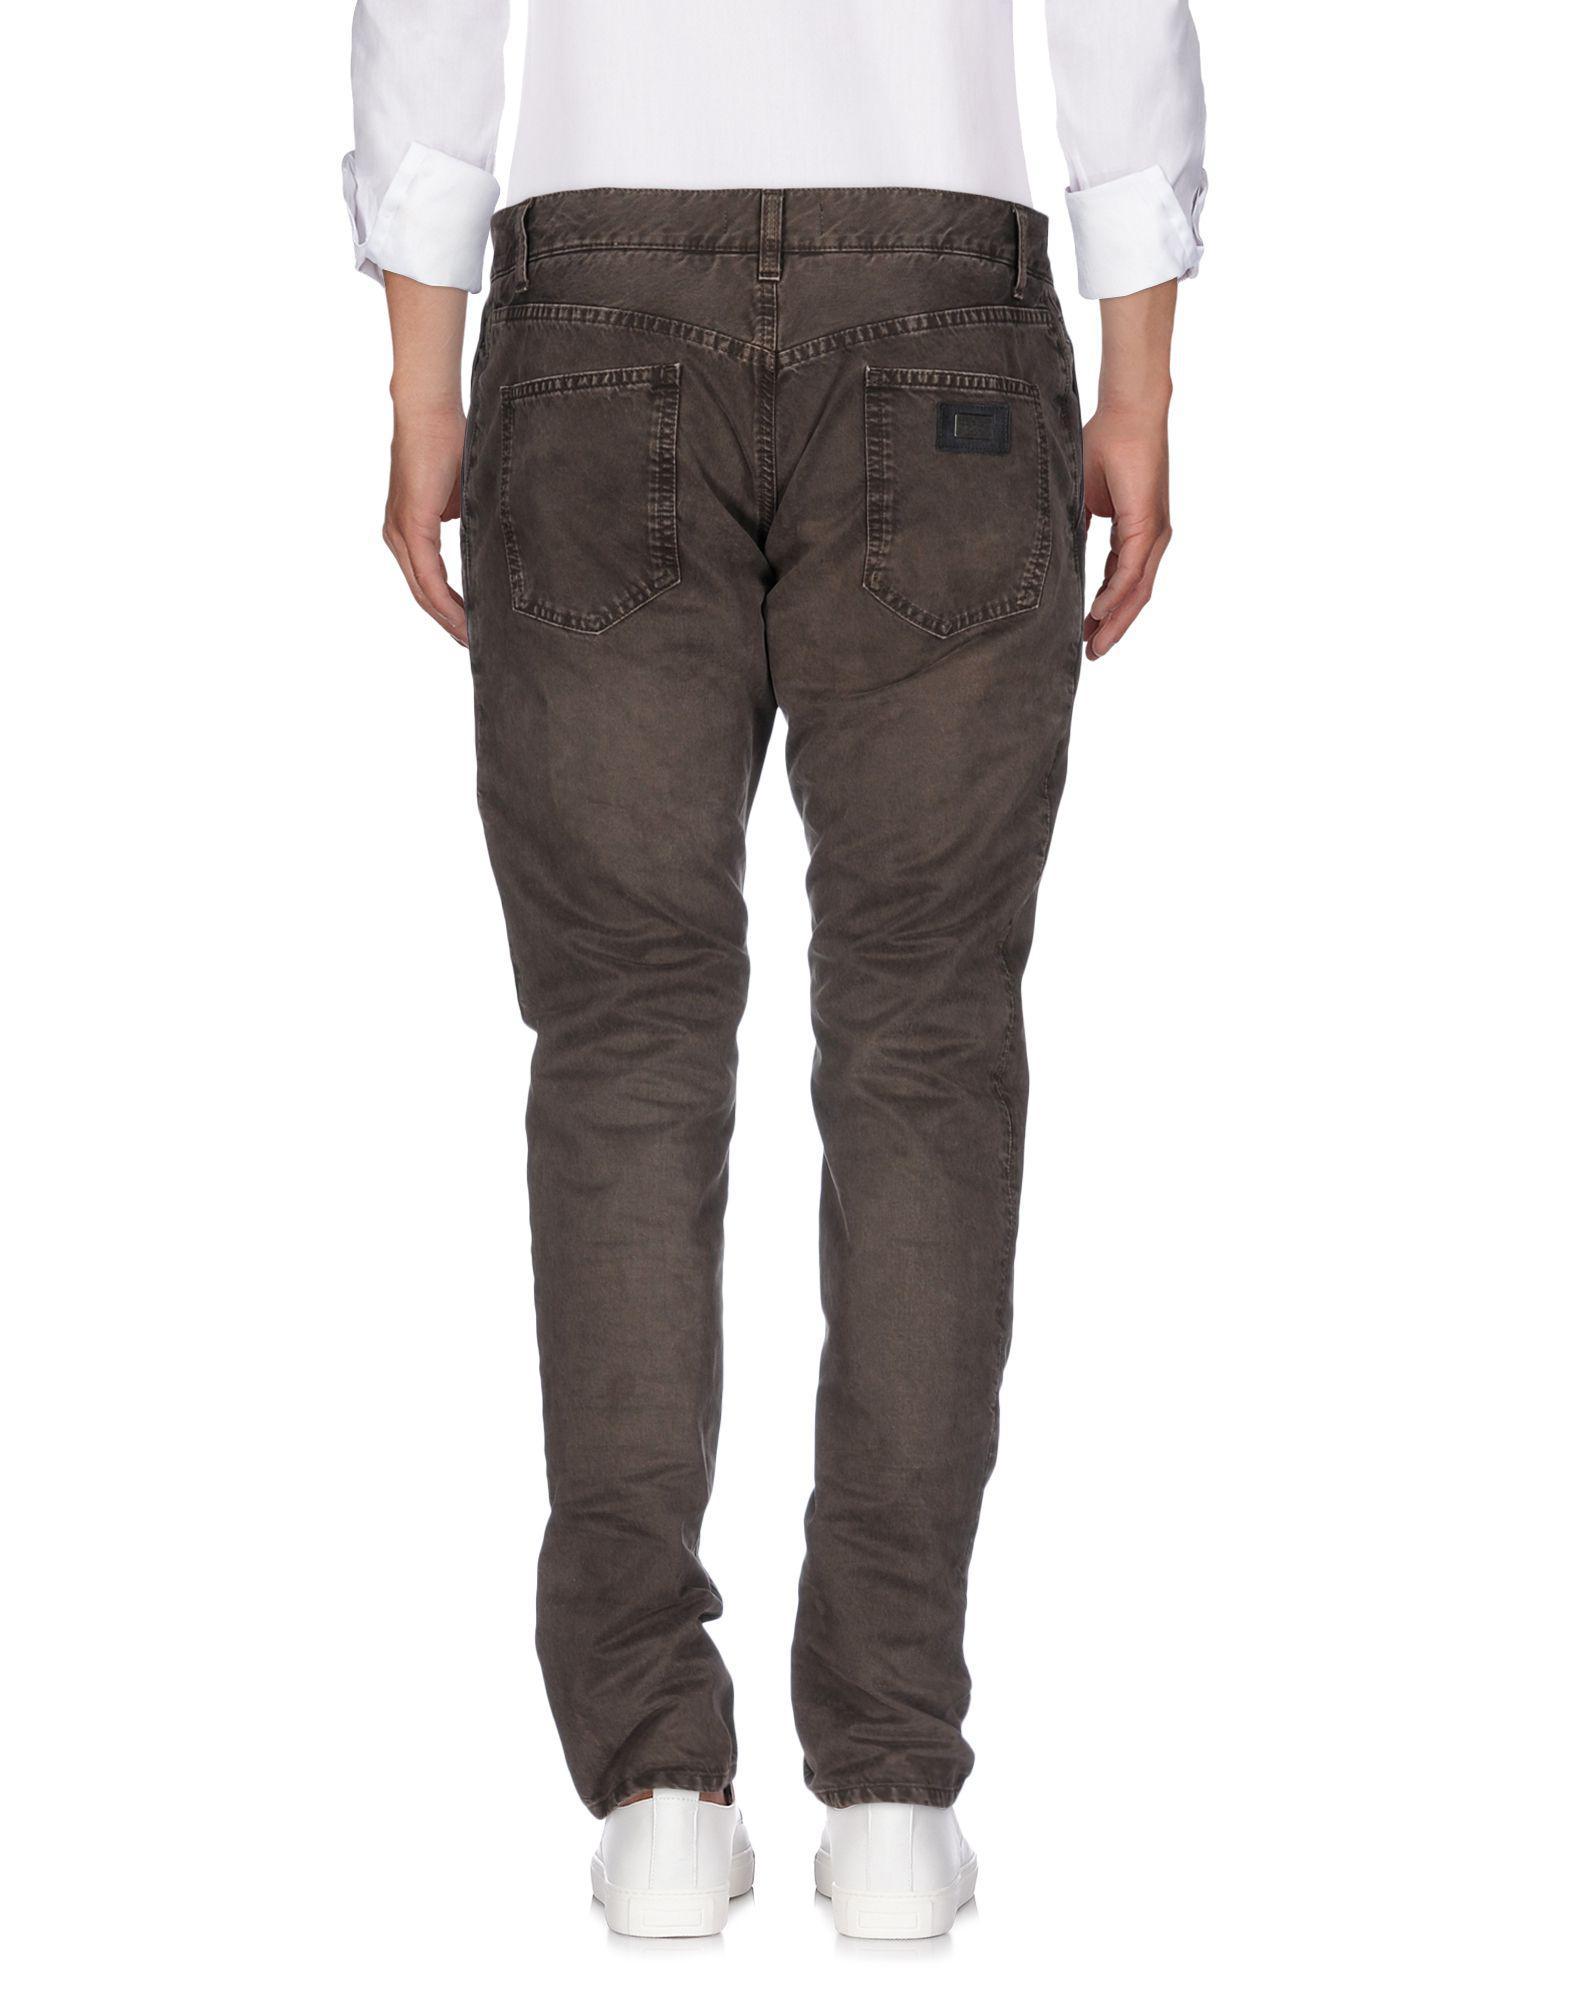 Dolce & Gabbana Denim Trousers in Khaki (Grey) for Men